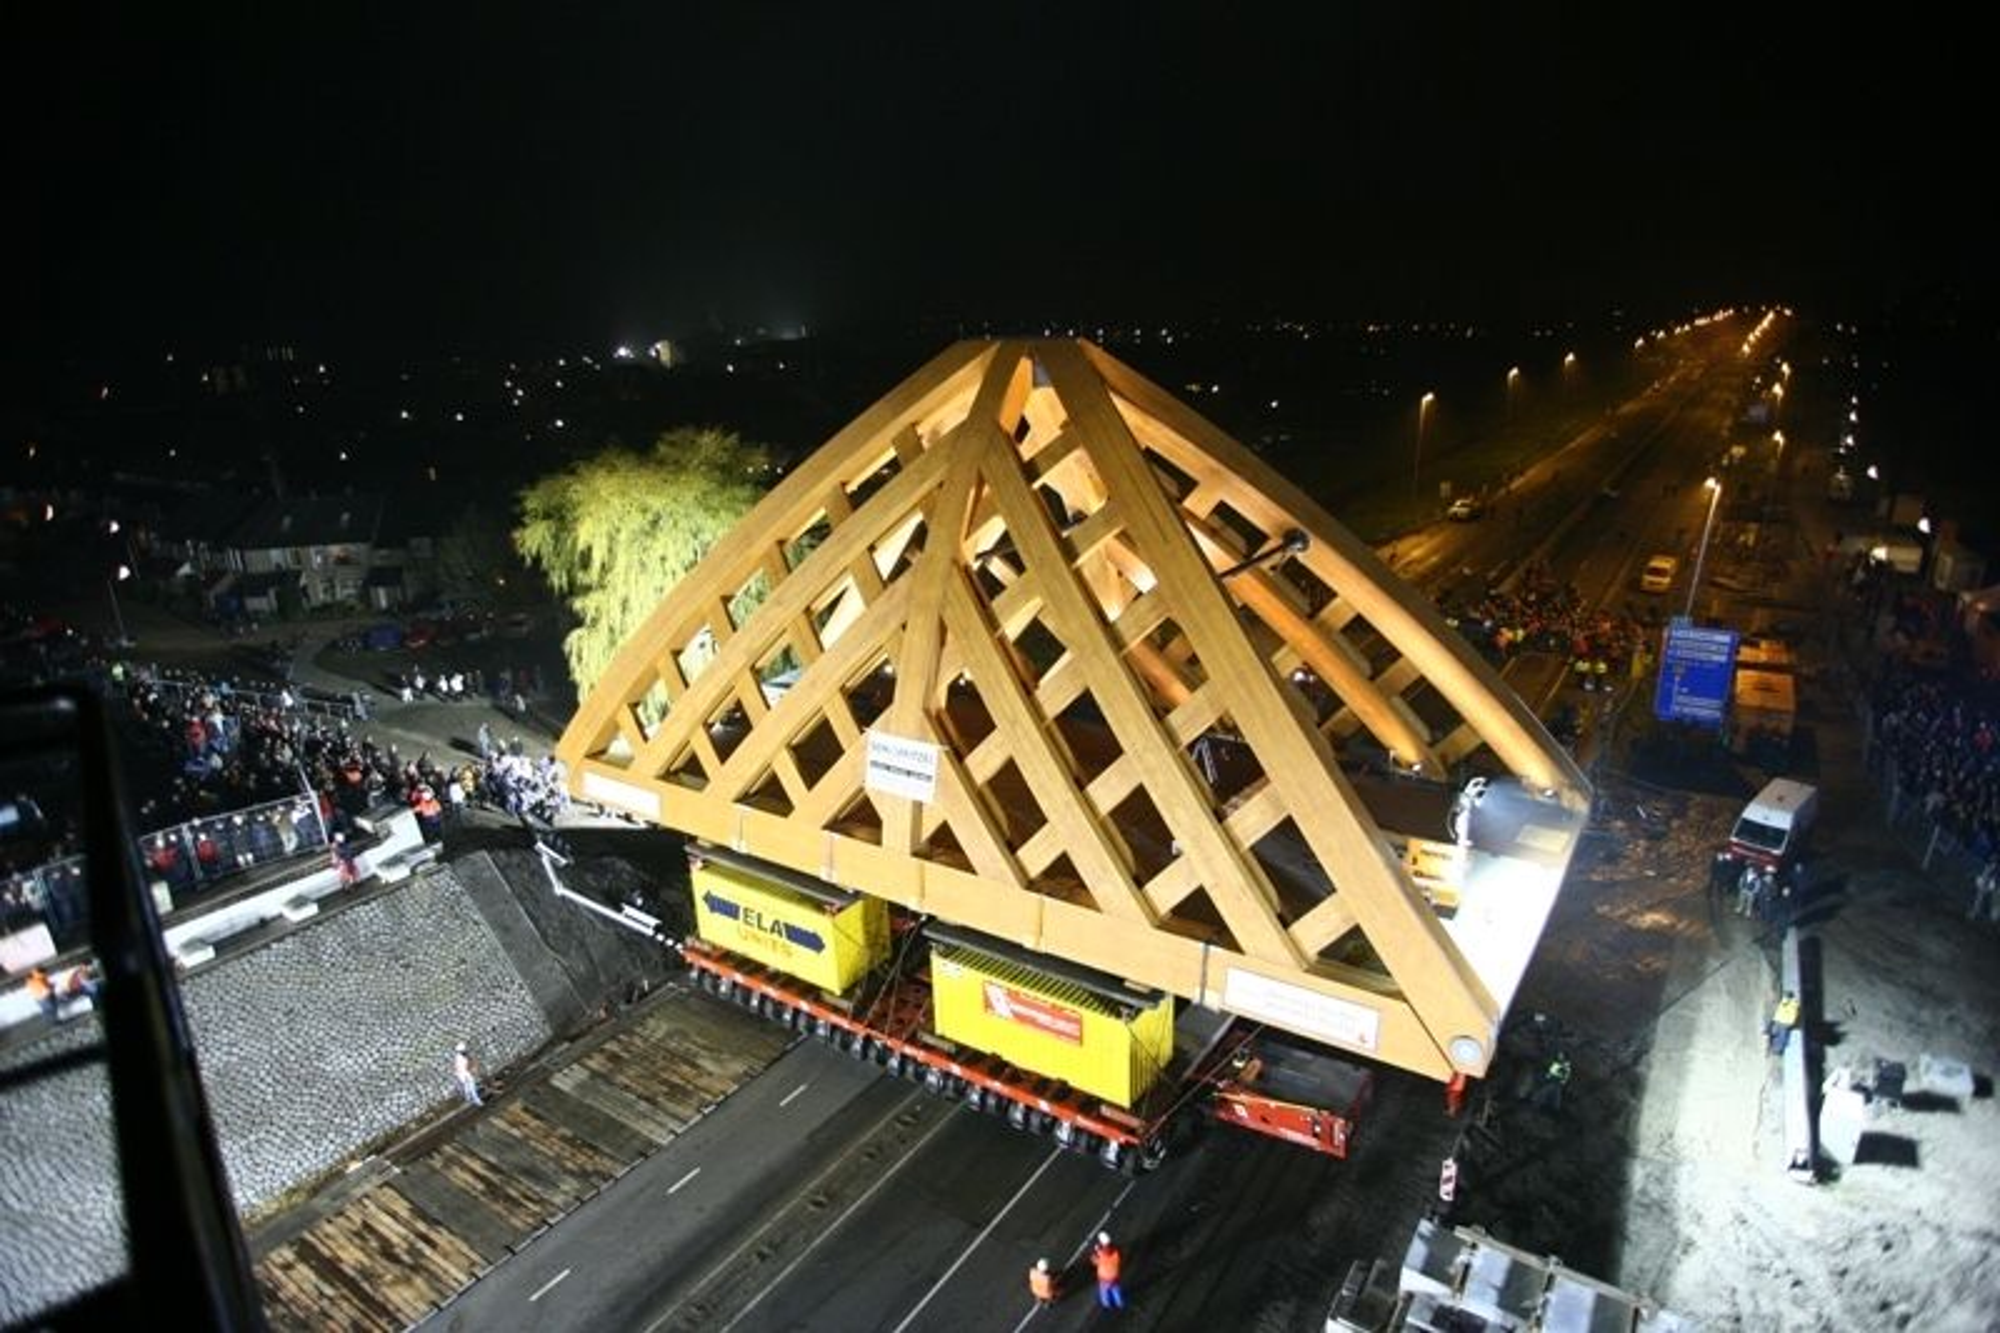 100 tonn, skal den tåle, trebroen i Sneek i Nederland. Treet kommer fra Titan Wood.